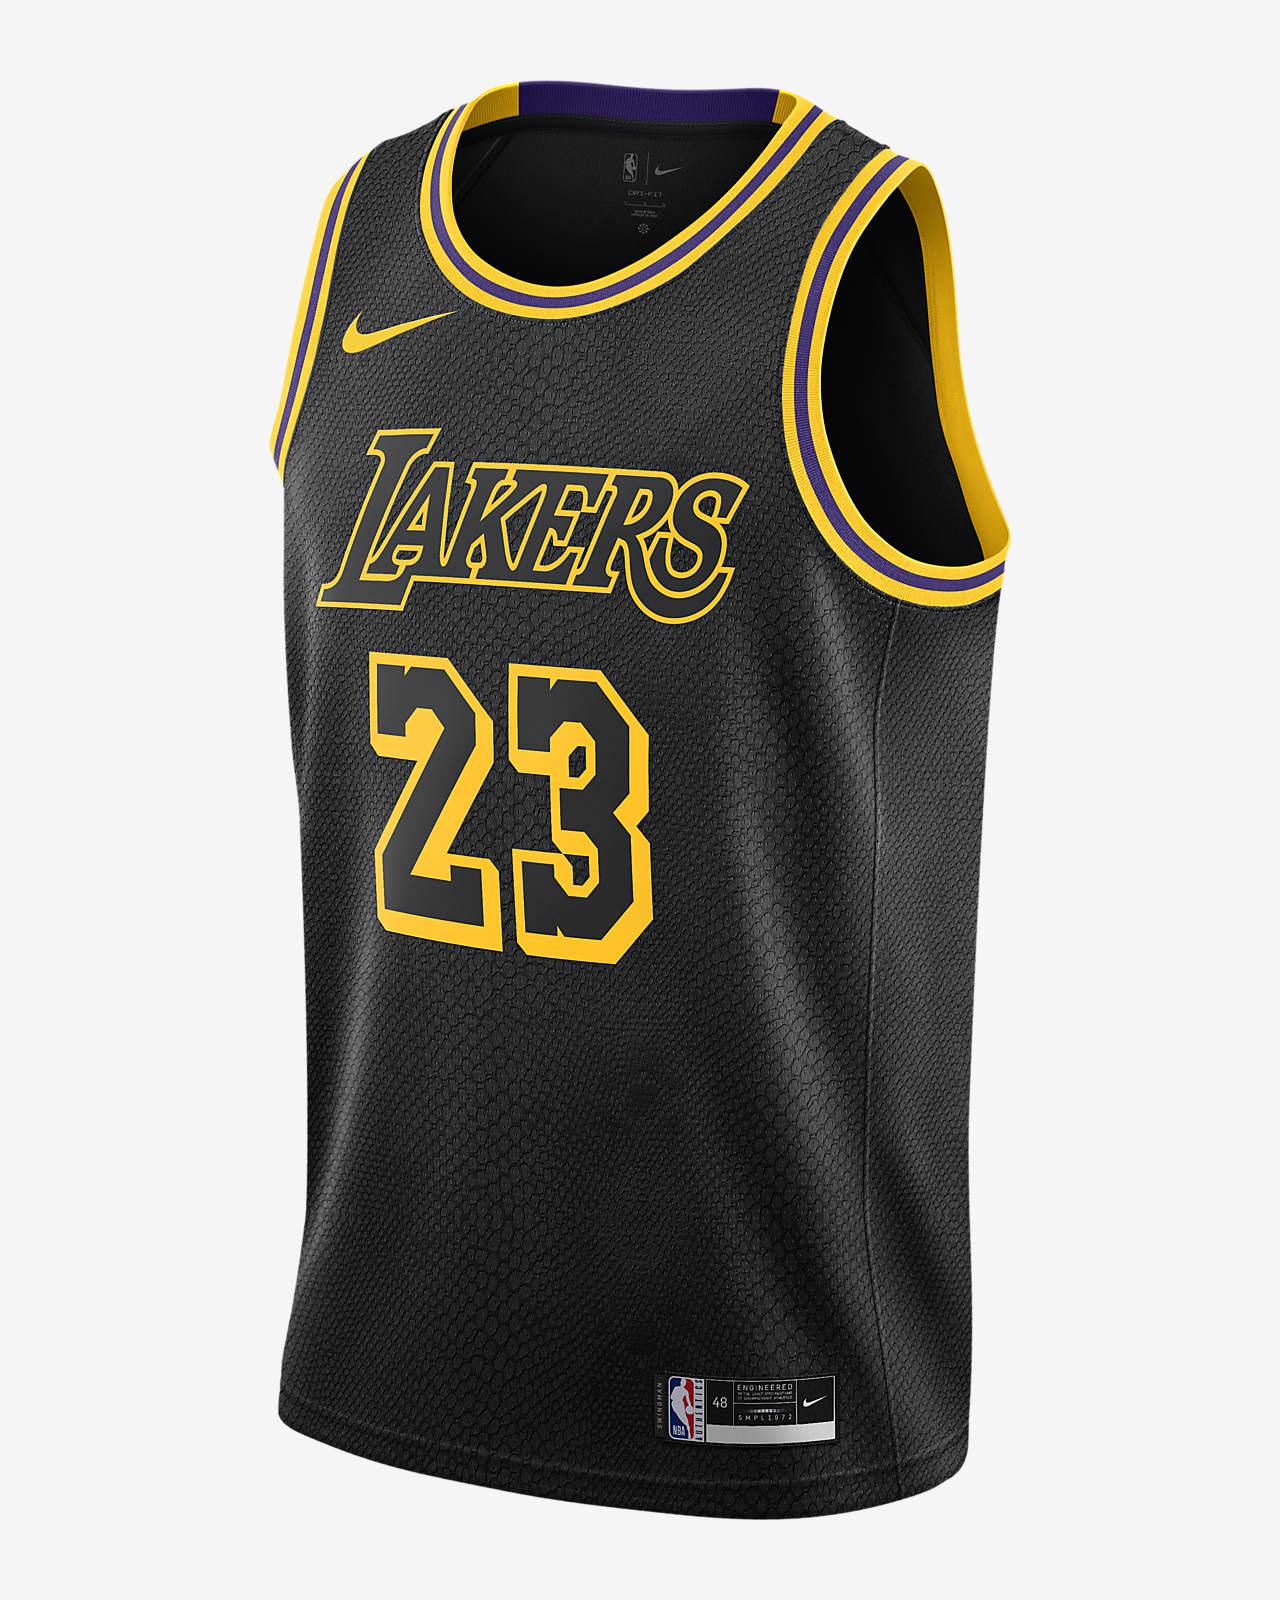 LeBron James Lakers Nike NBA Swingman Jersey